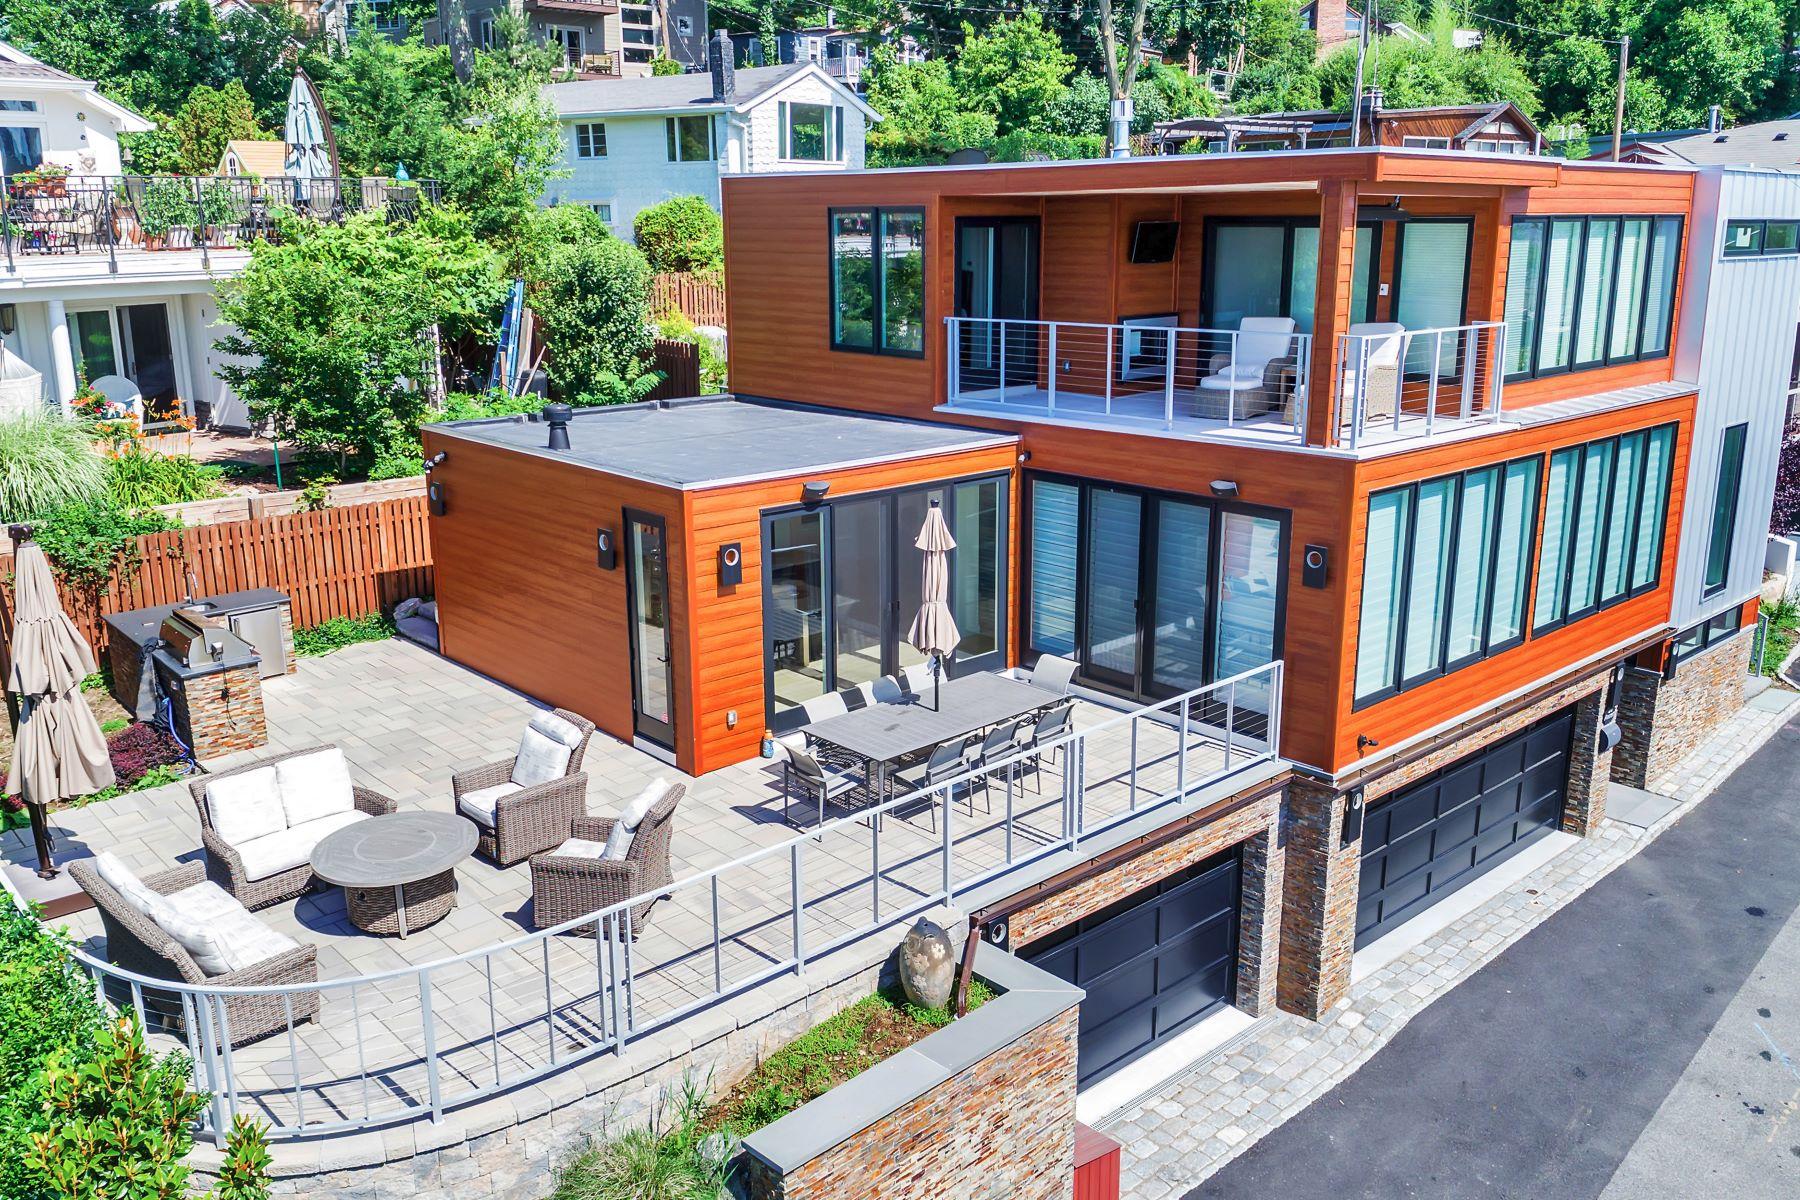 Co-op Properties para Venda às Edgewater Colony 20 Annett Avenue, Edgewater, Nova Jersey 07020 Estados Unidos